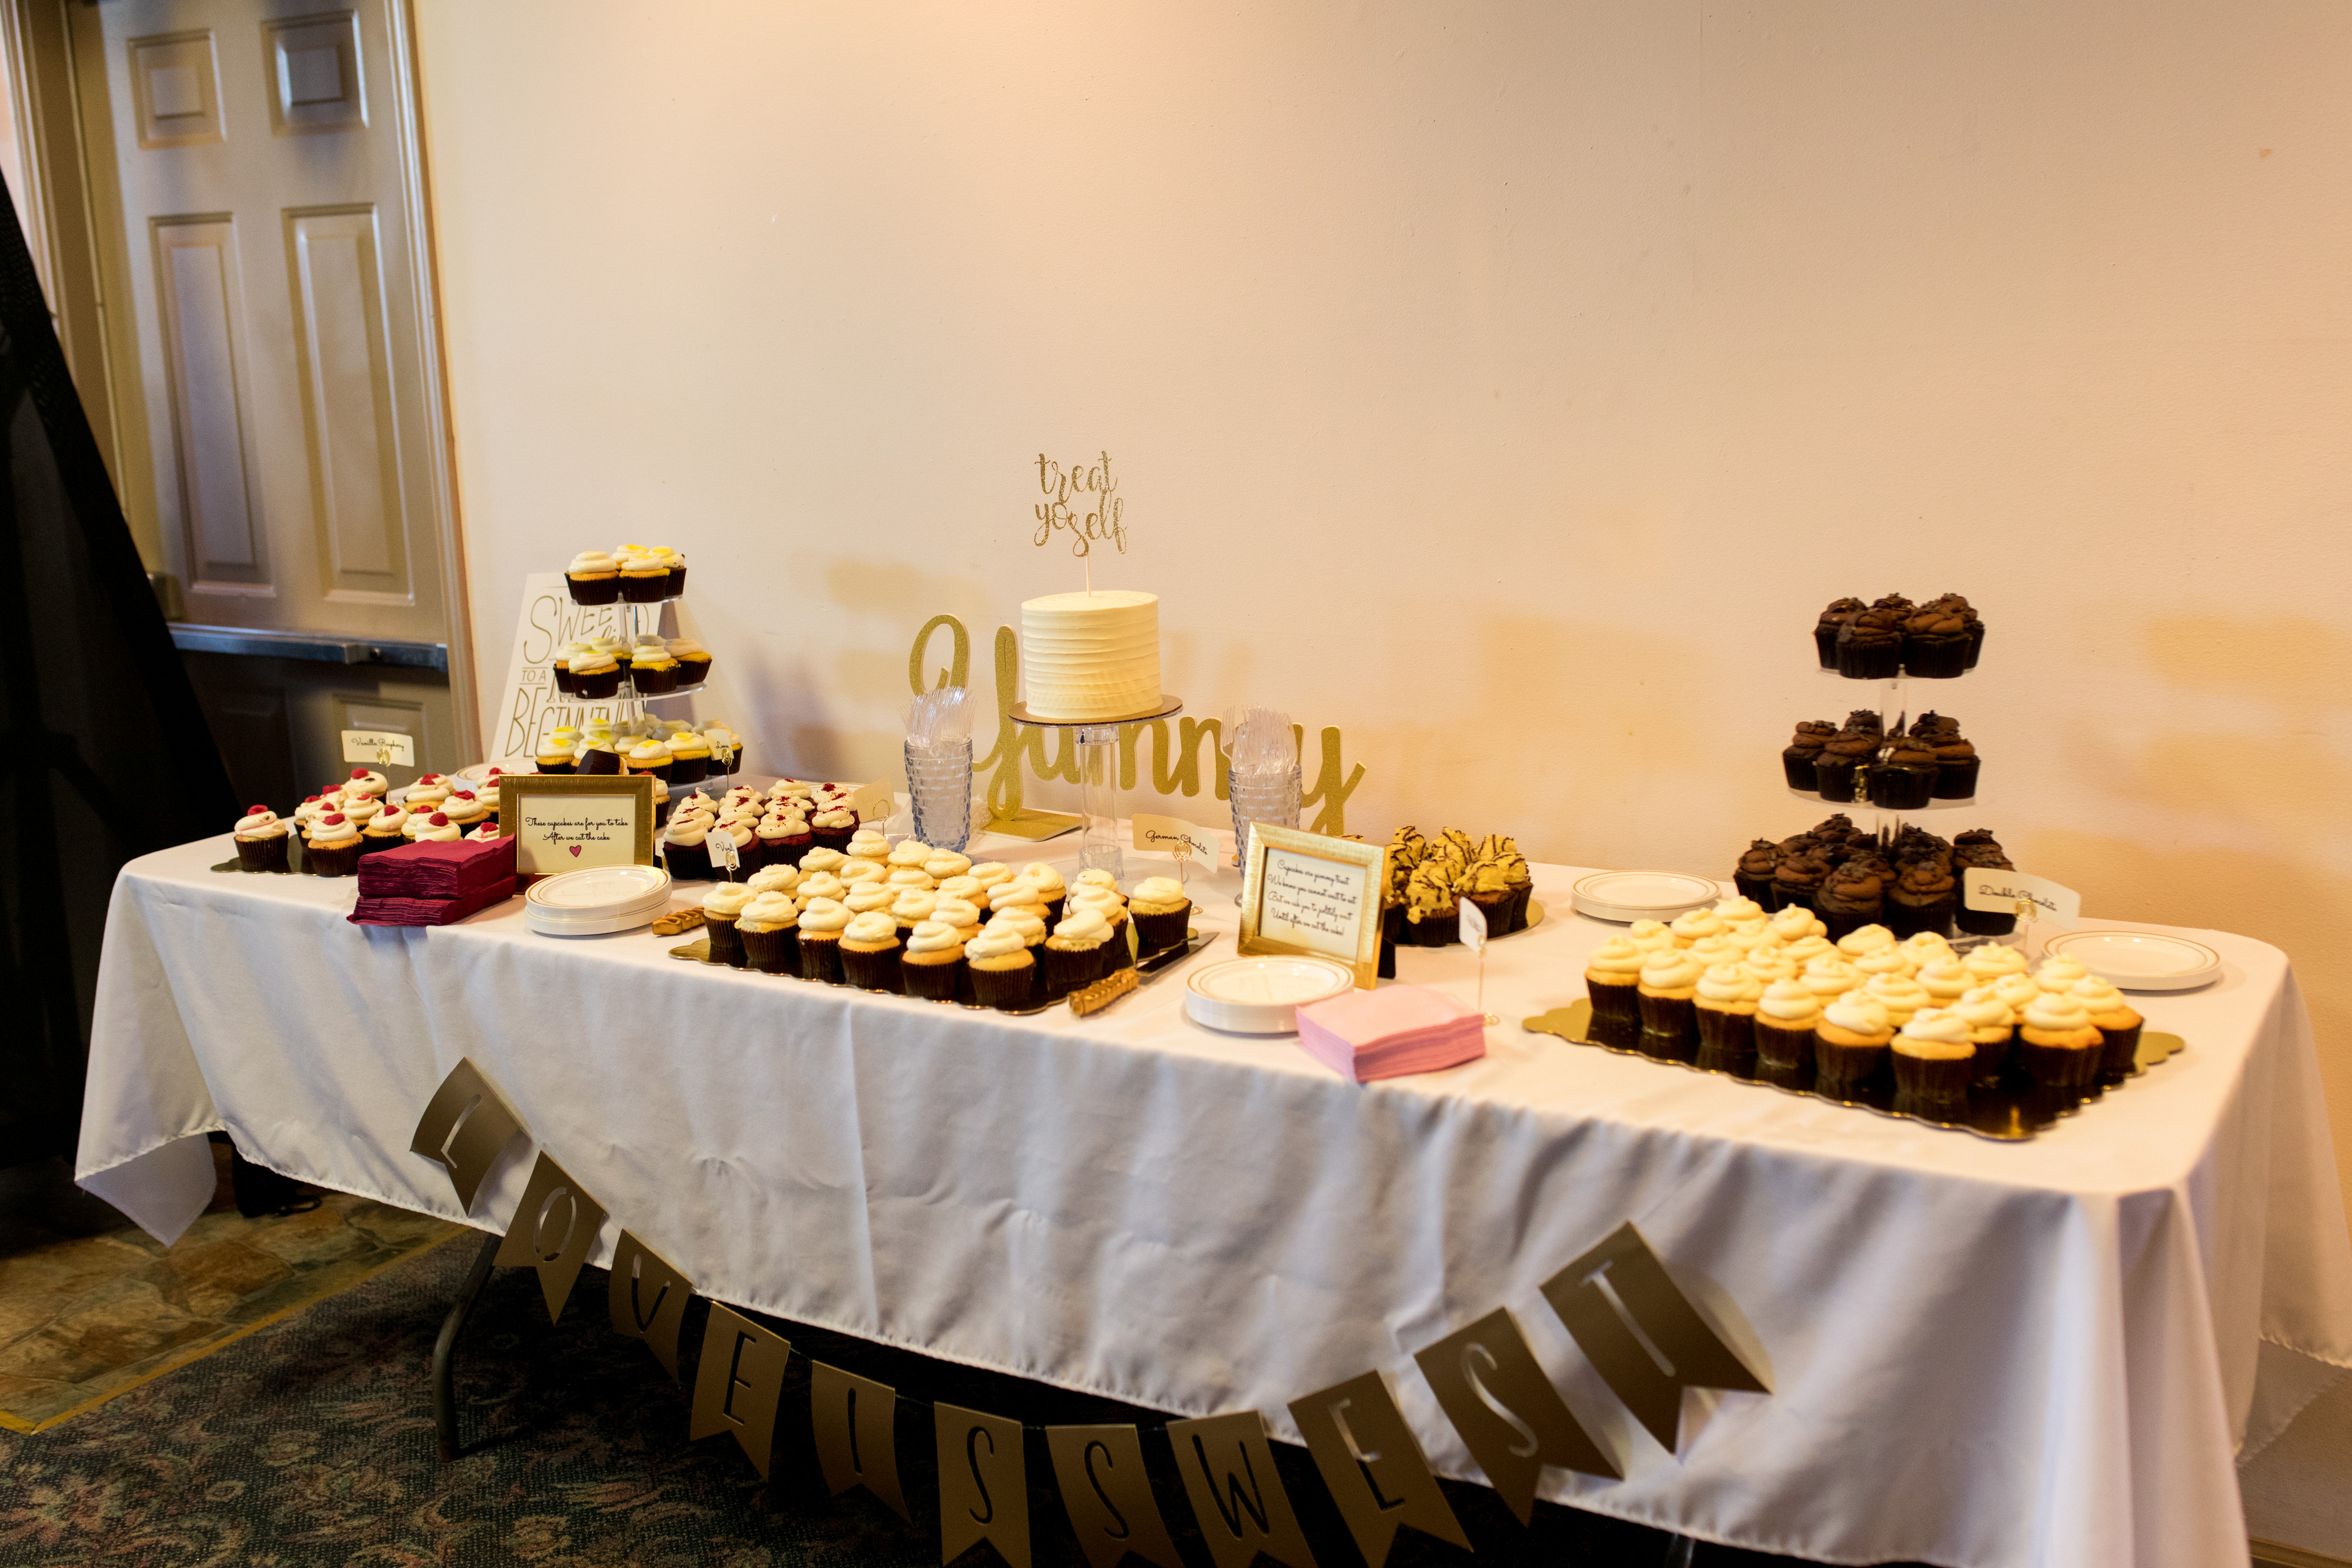 wedding cupcakes from Indulgence Bakery in Kokomo Indiana